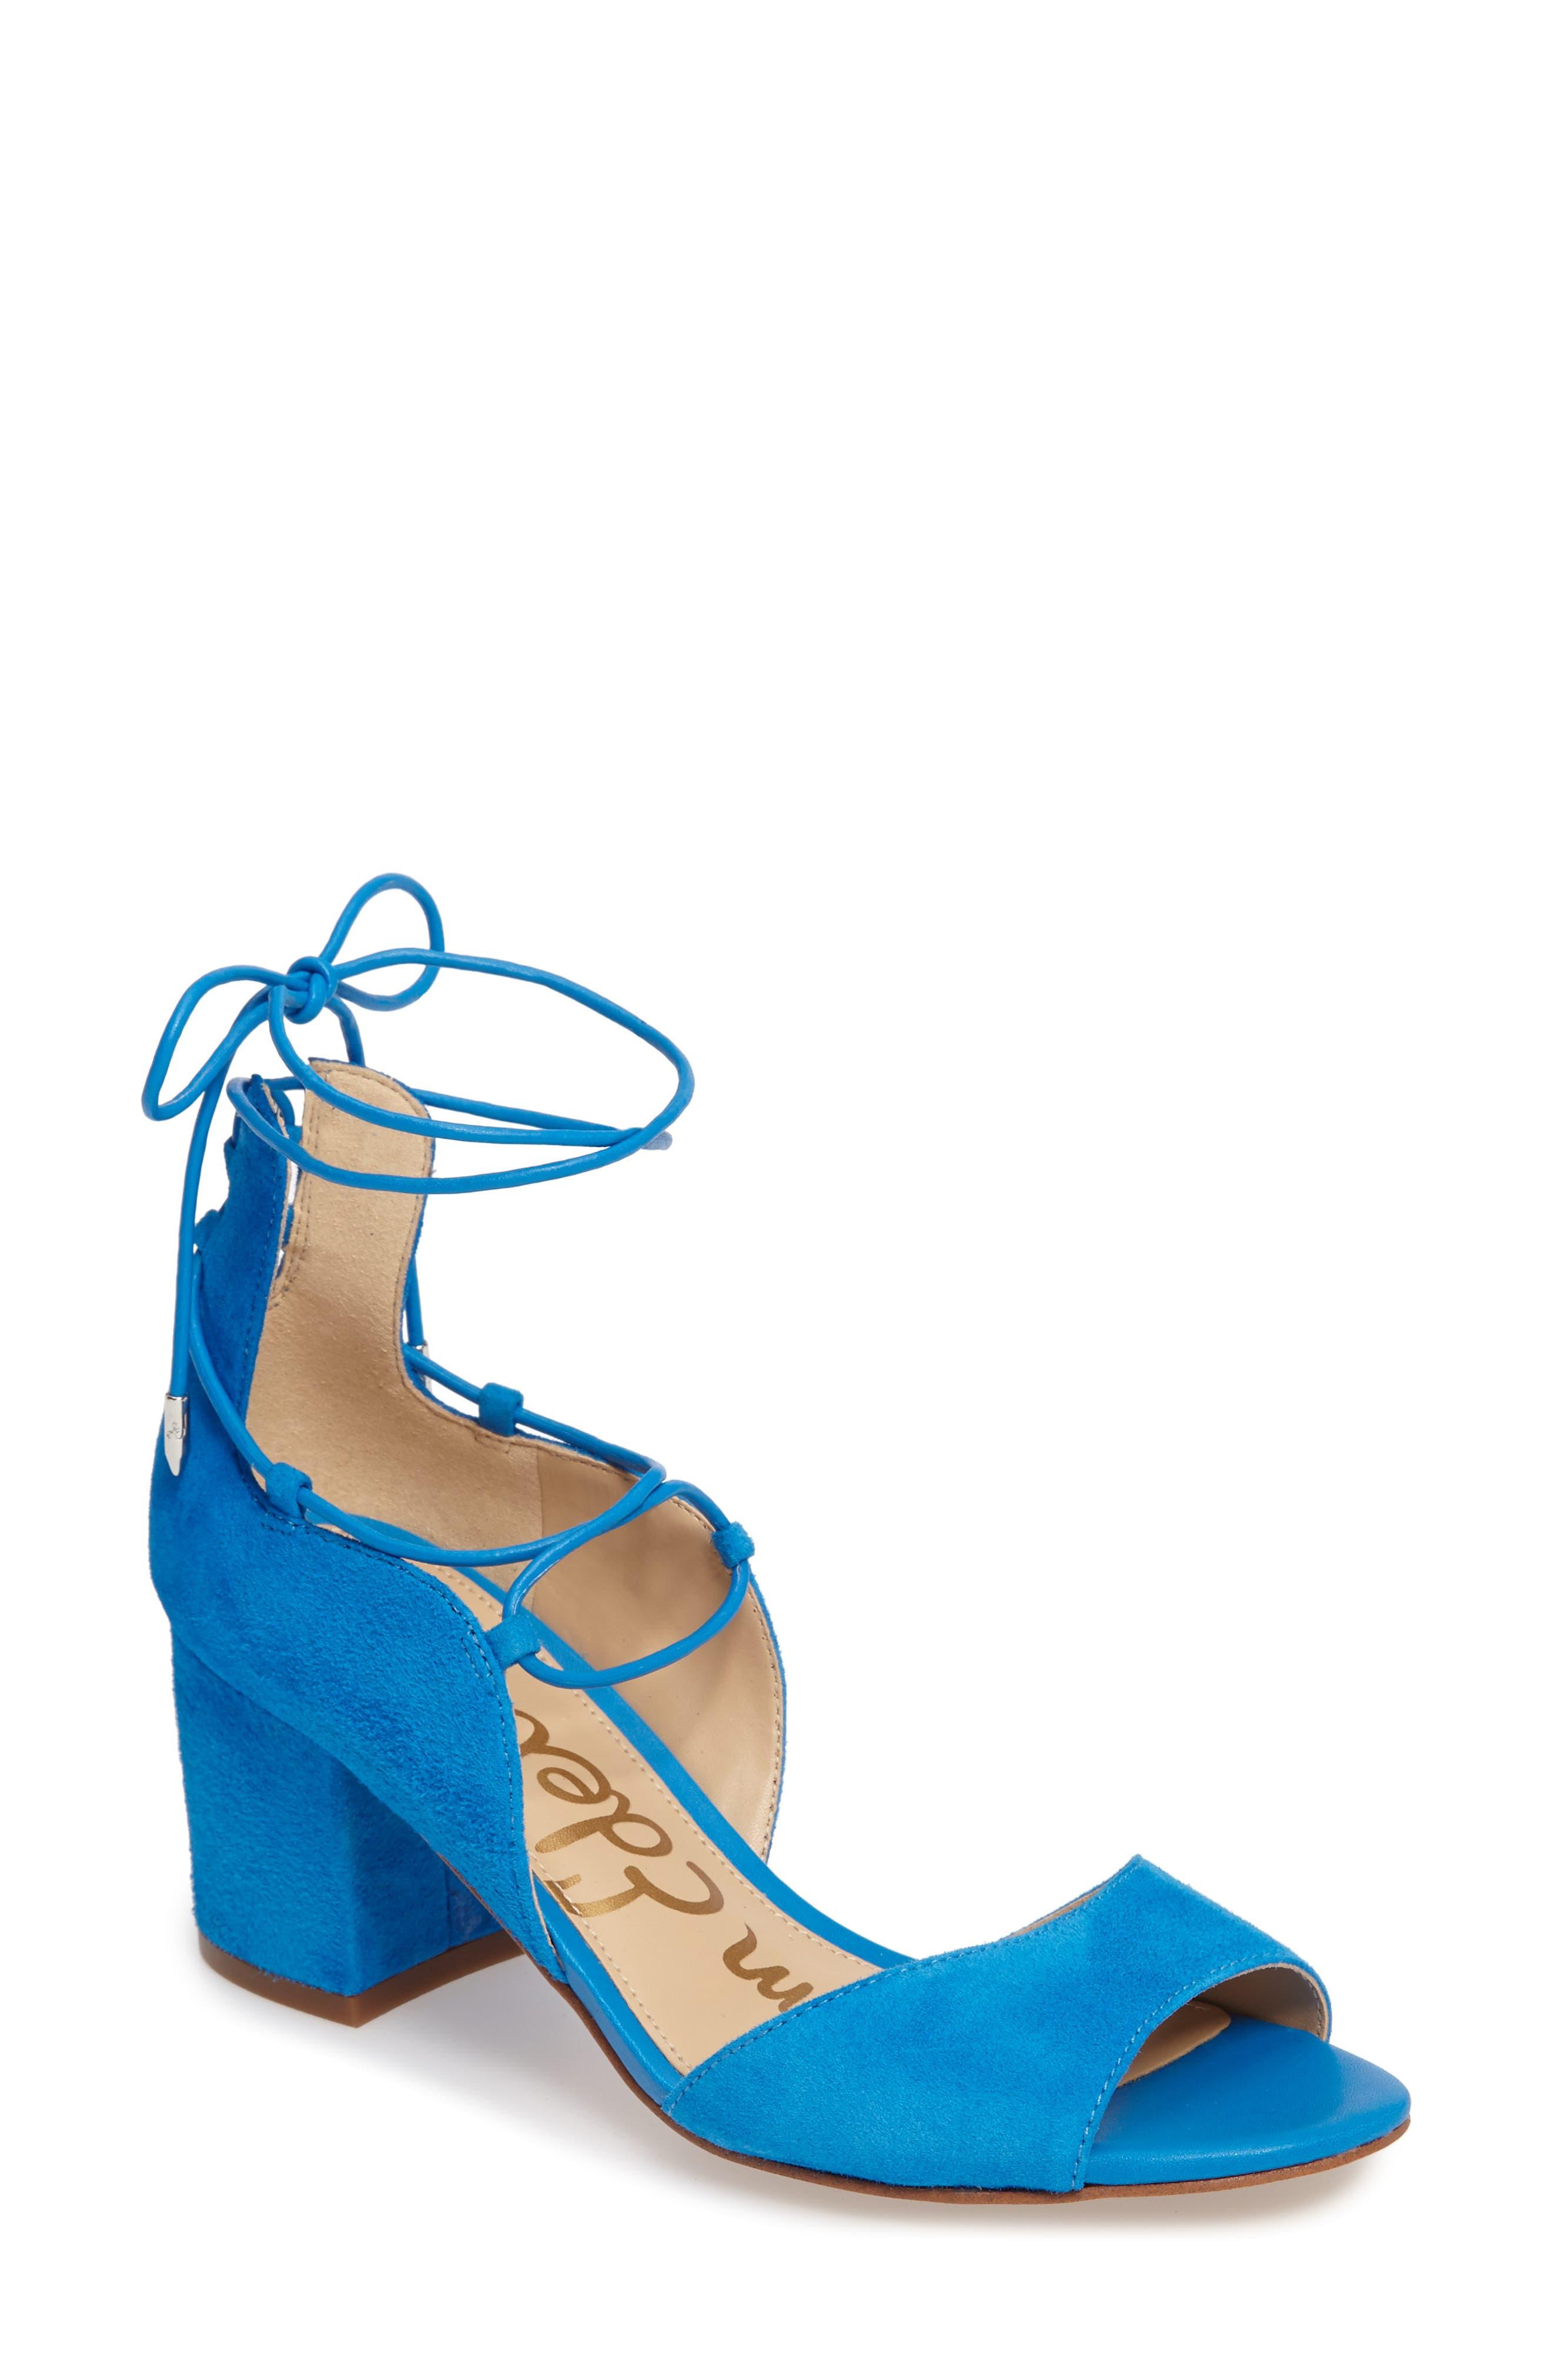 Main Image - Sam Edelman Serene Lace-Up Sandal (Women)